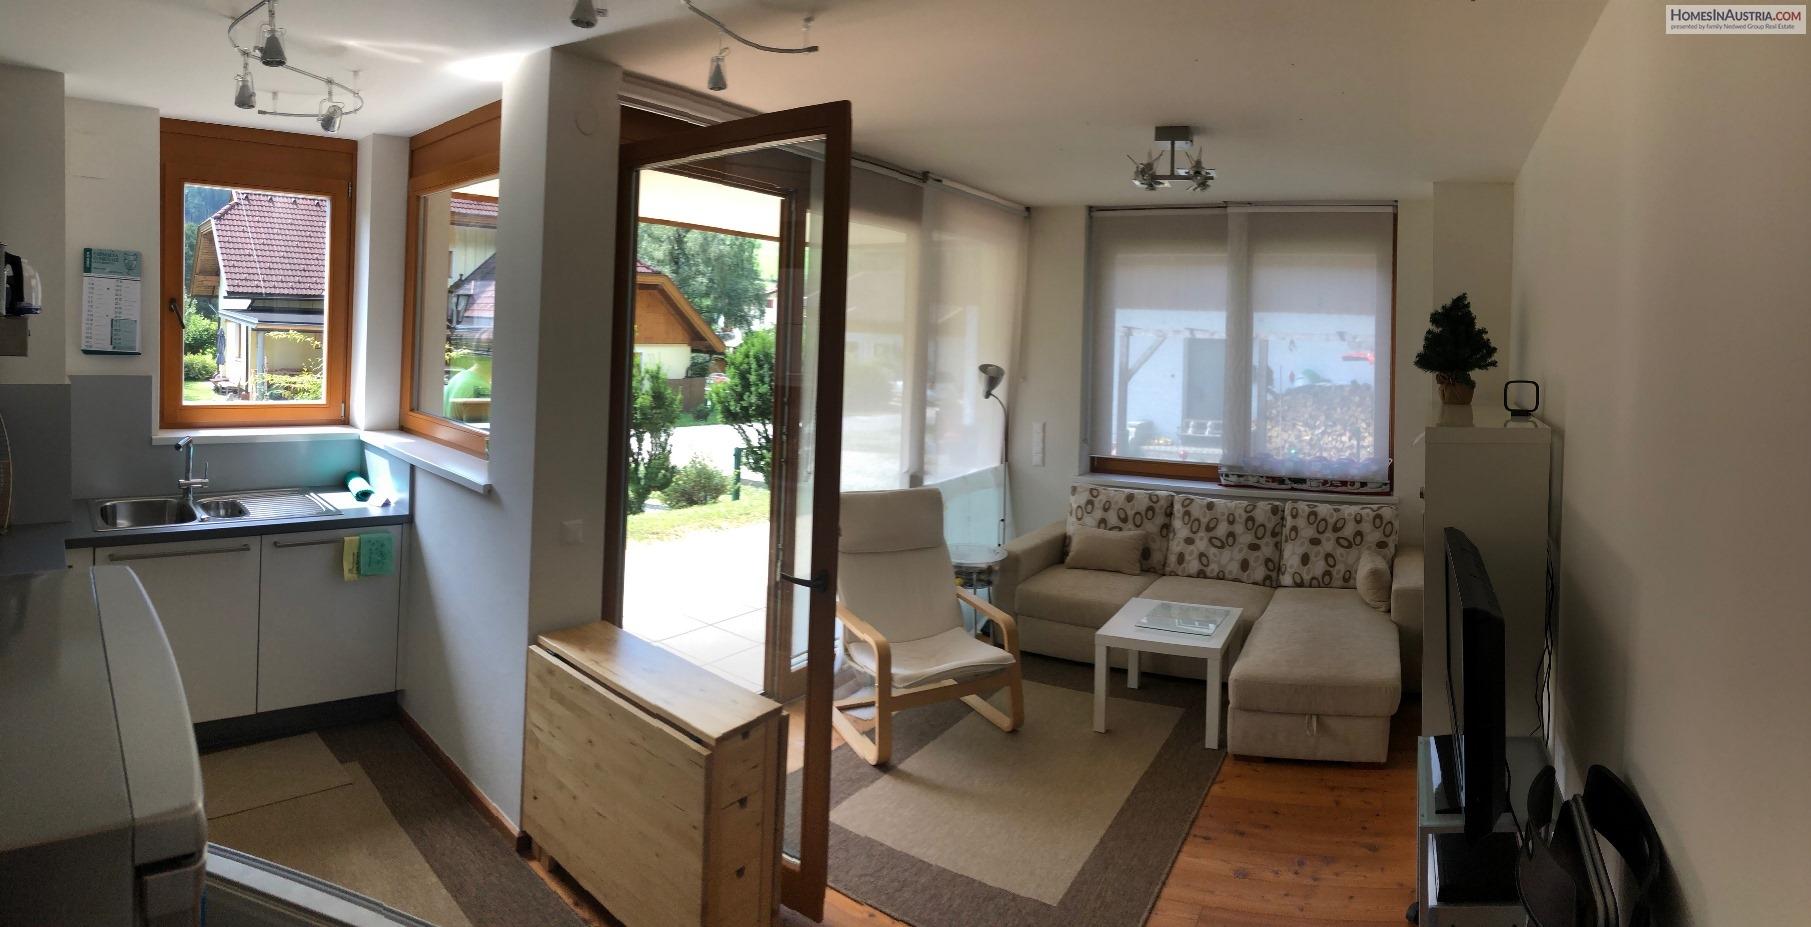 Bad Kleinkirchheim, Carinthia, Apartment (BRAHMS), sunny, terrace and garden